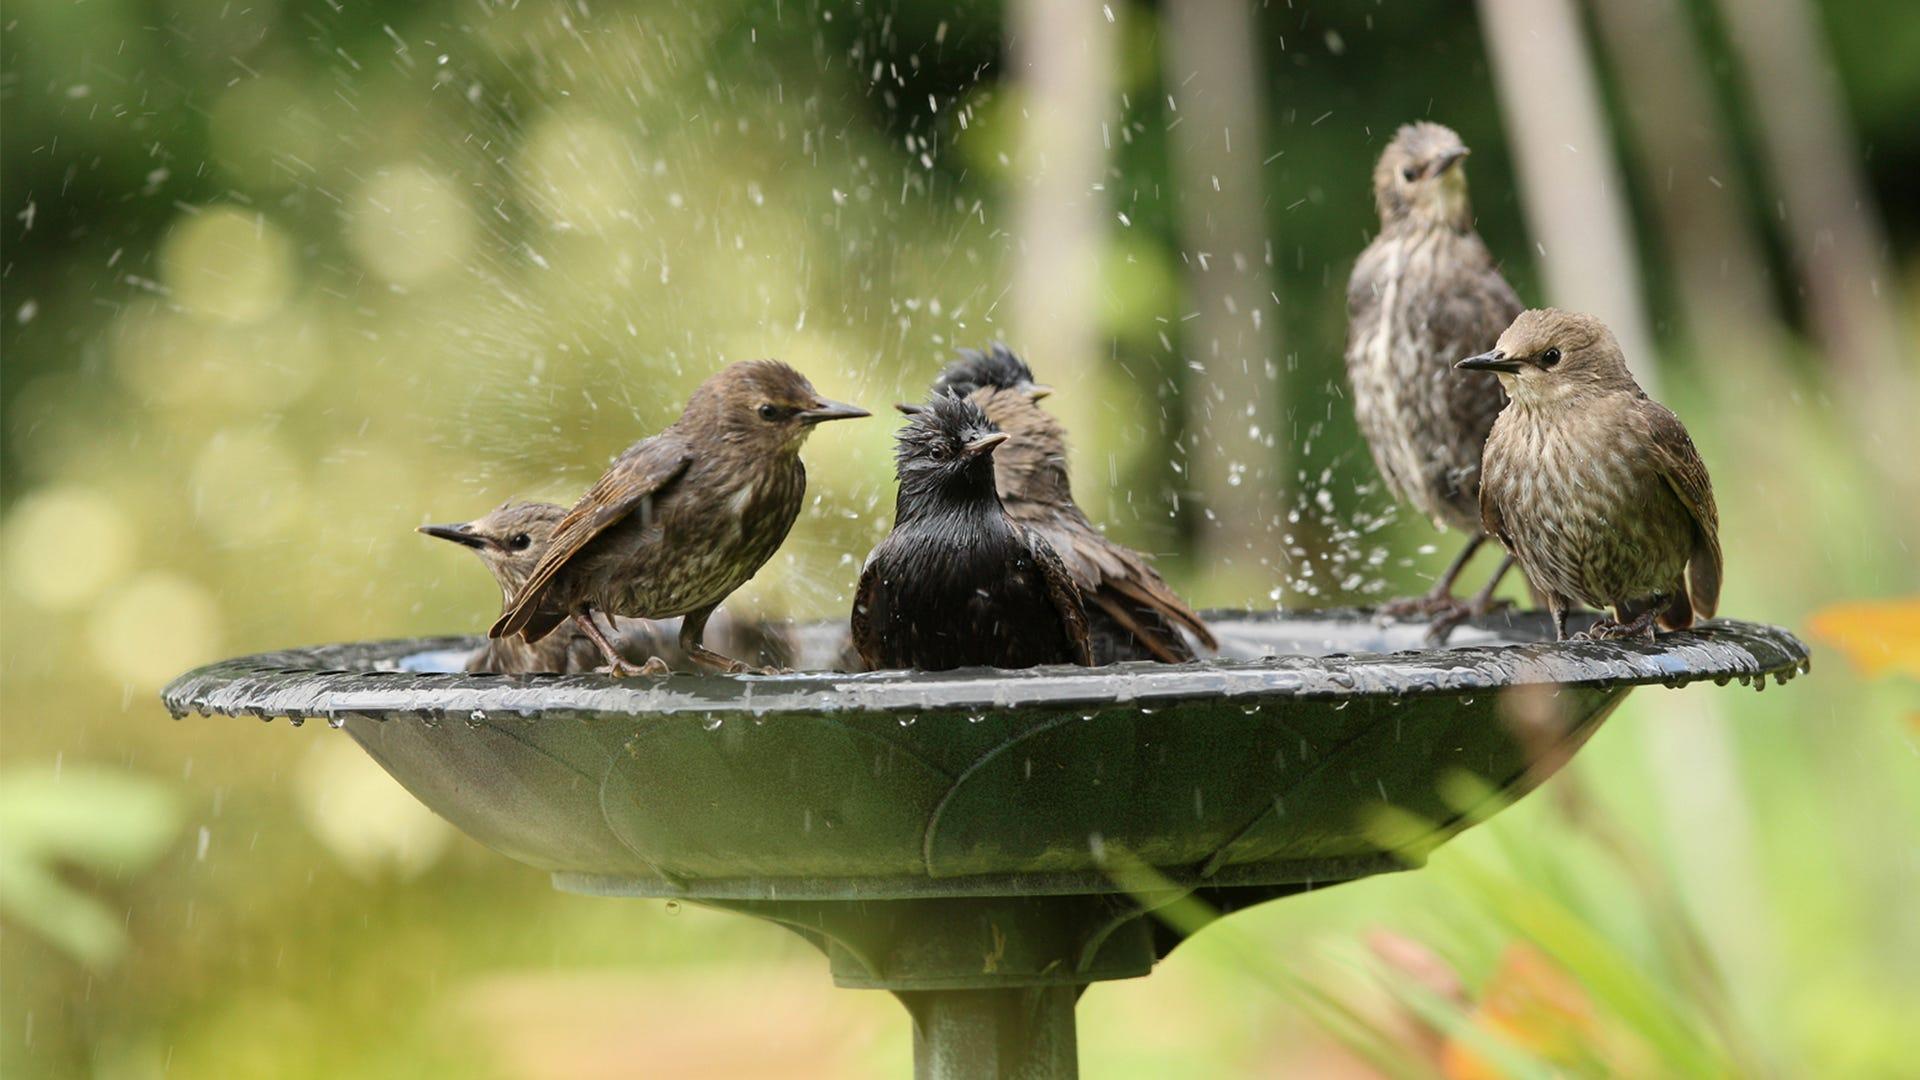 How to Build A Homemade Bird Bath